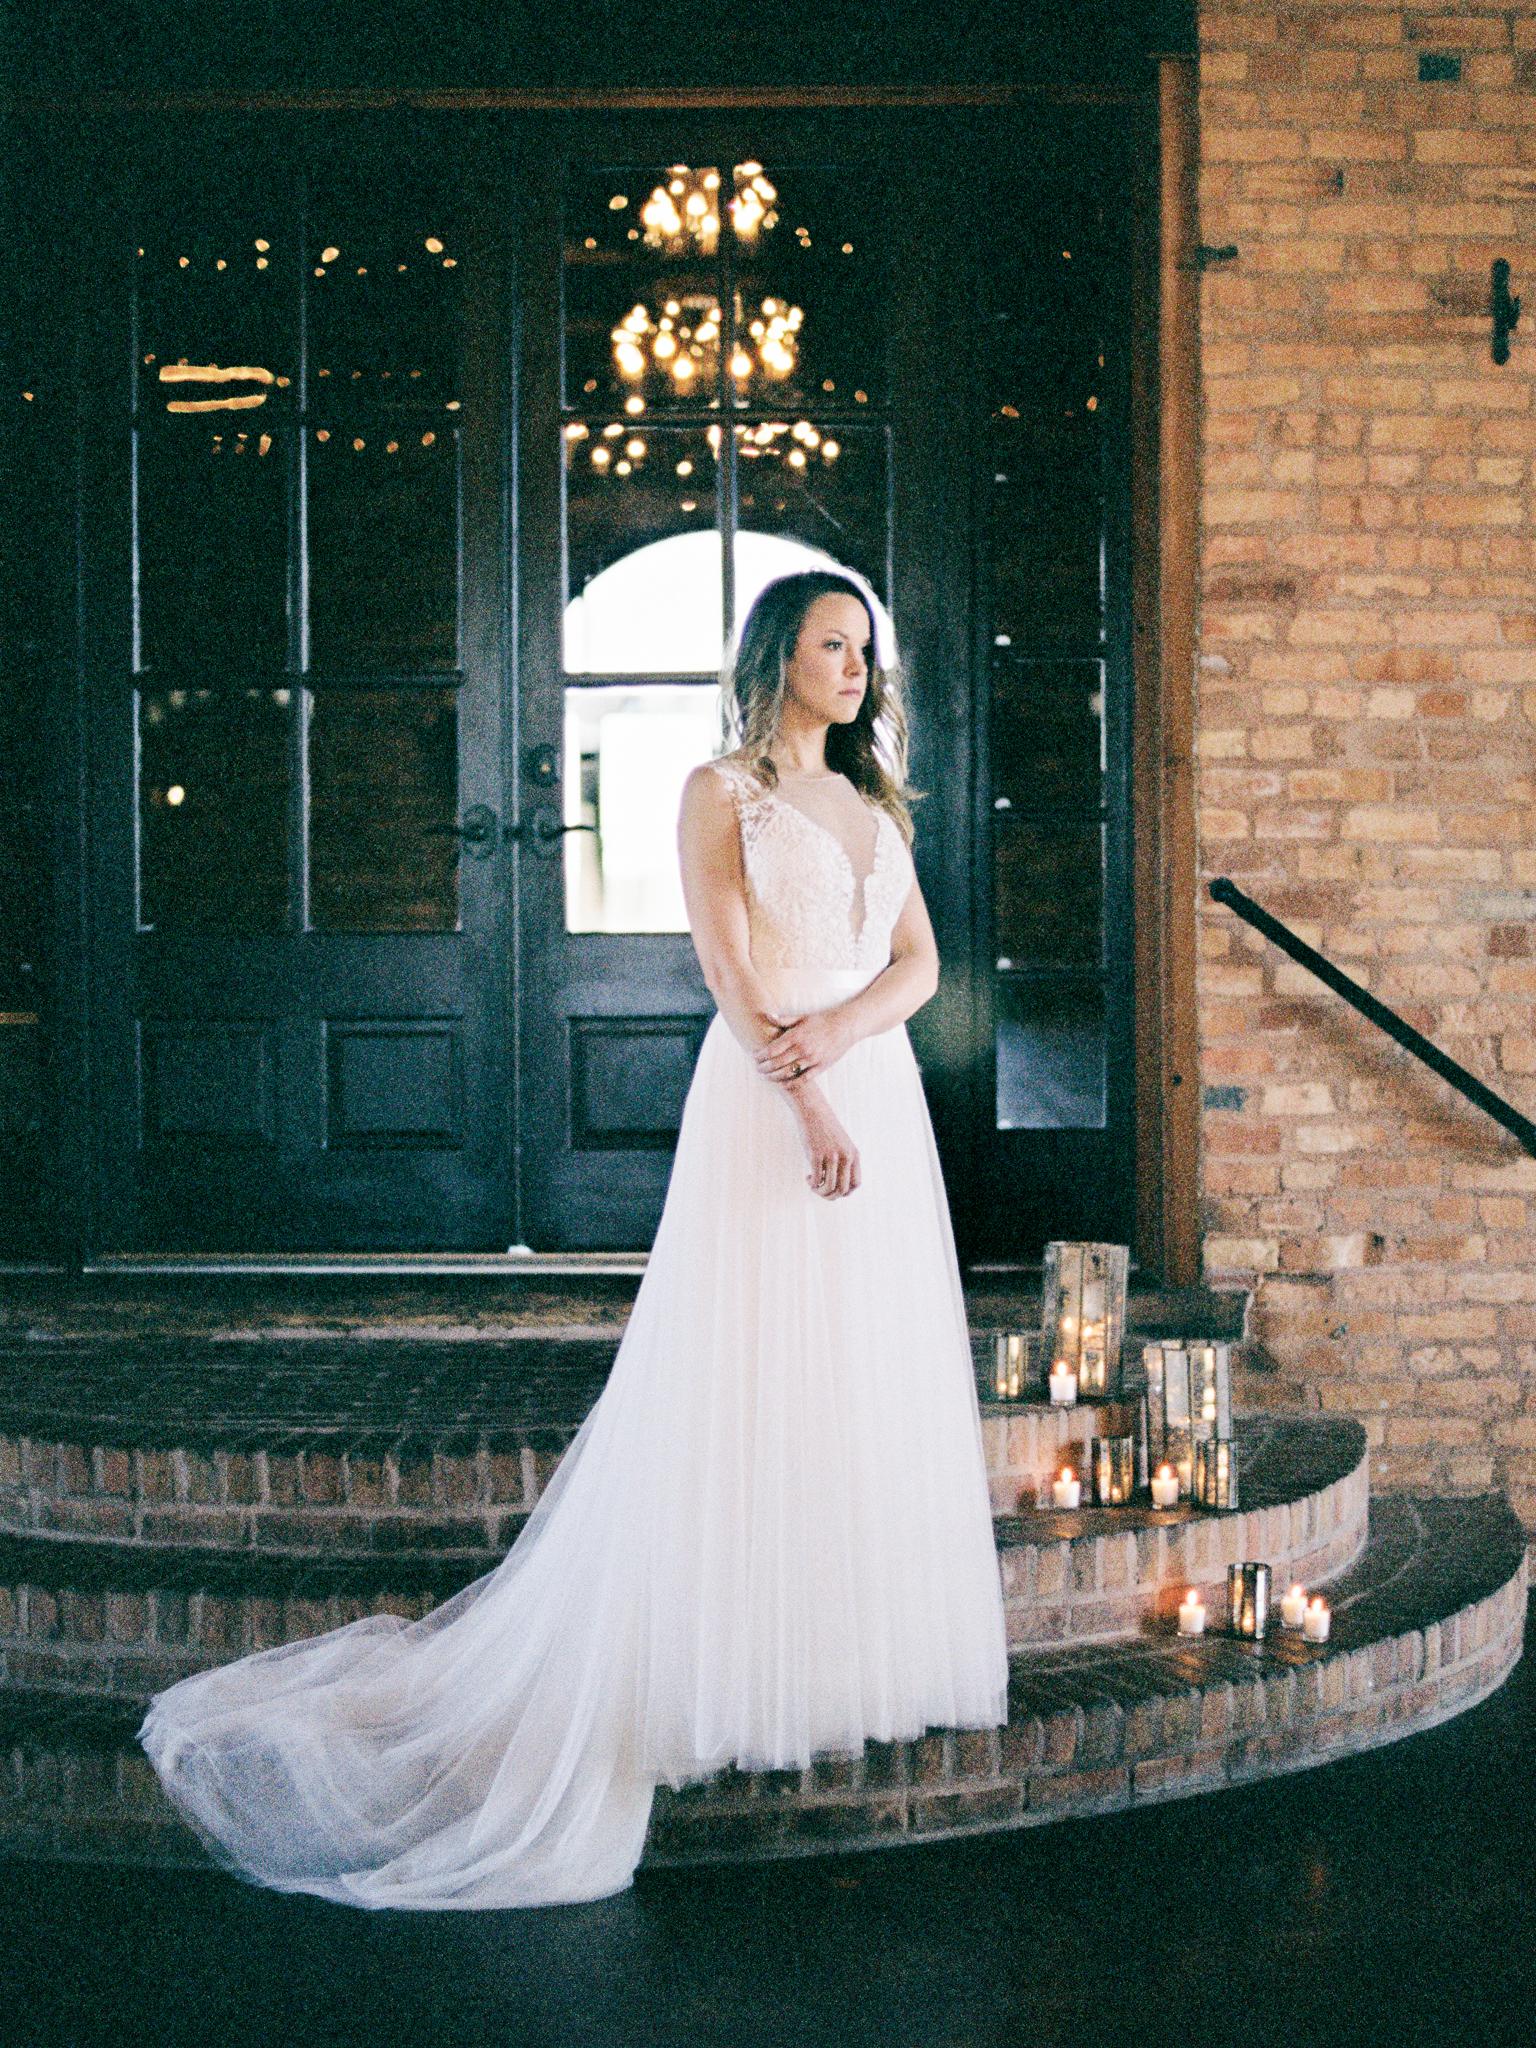 christinadavis+weddinginspiration28.jpg